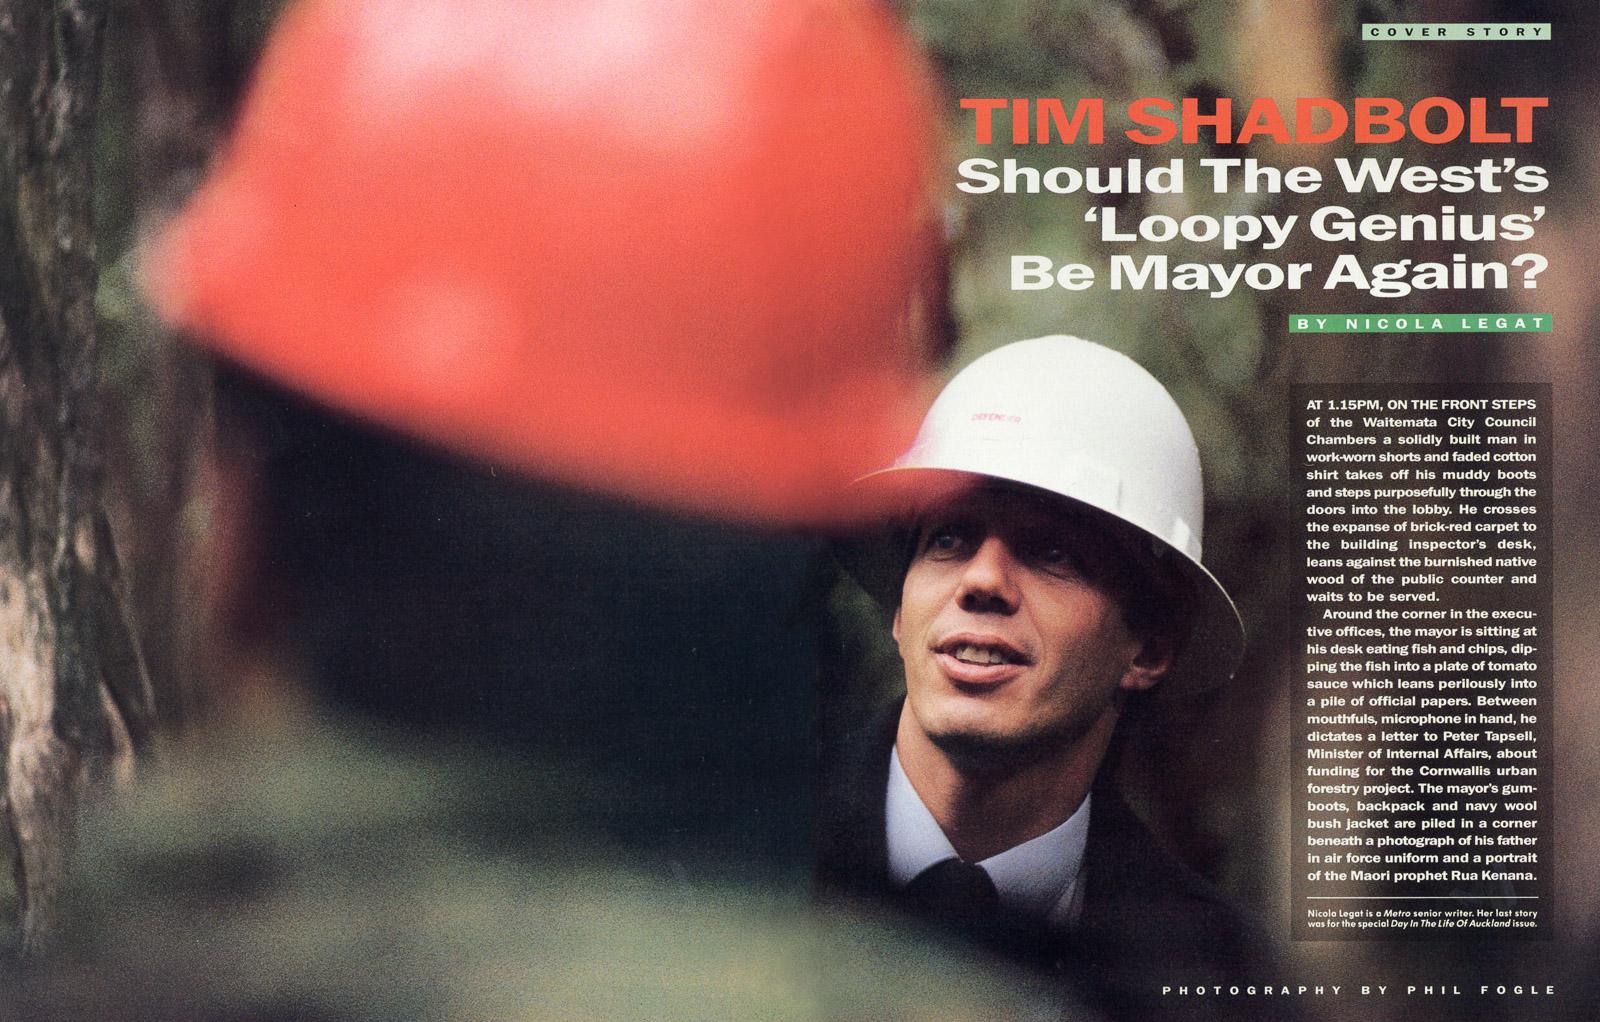 Tim Shadbolt,Mayor of Waitakere